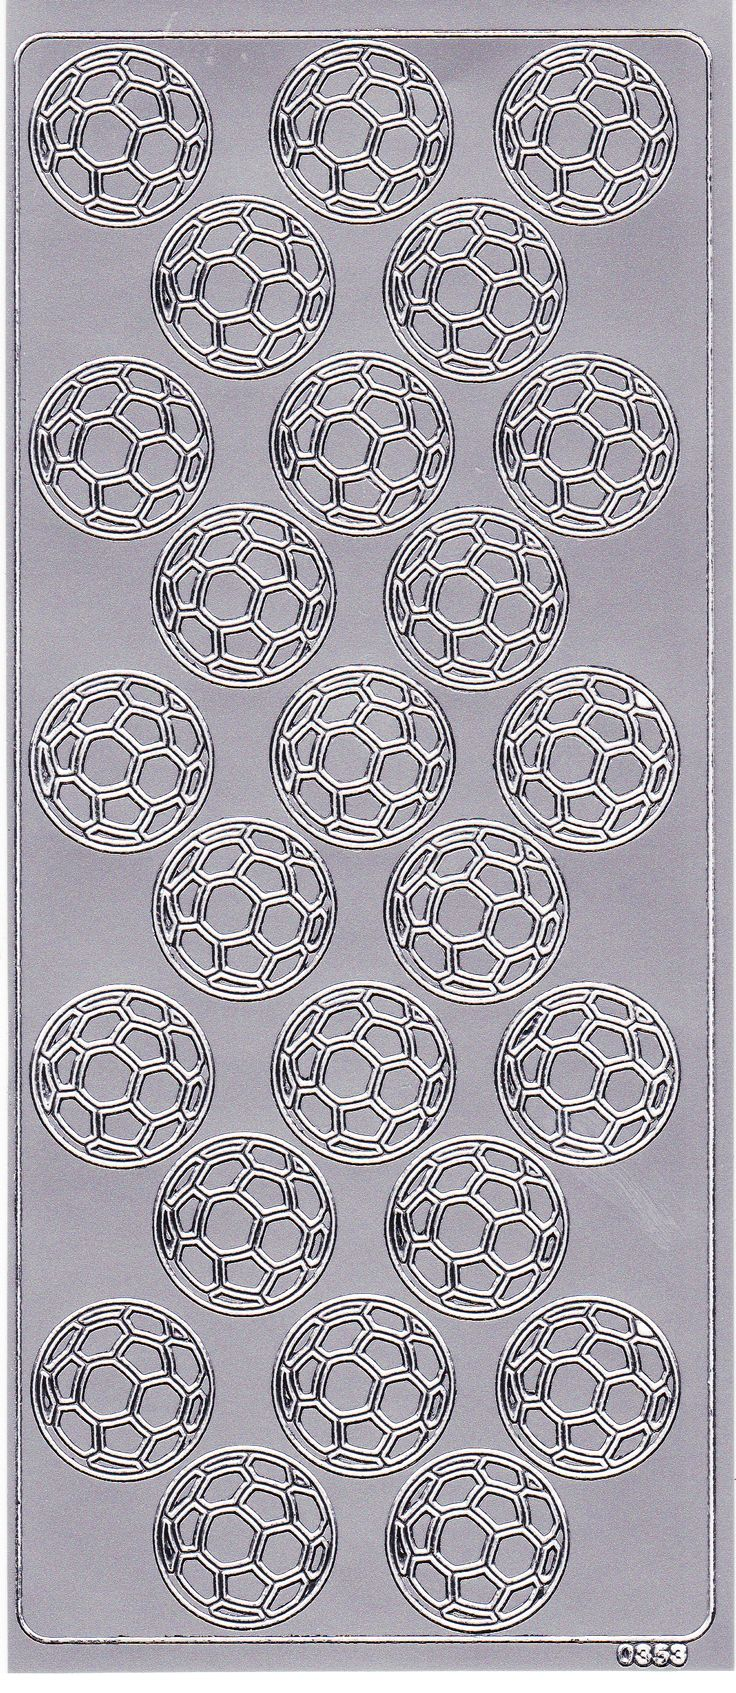 Stickers ark med flotte sølv farvet fodbolde fra Sjovogkreativ.dk til invitationer og festsange til konfirmation og fødselsdag.